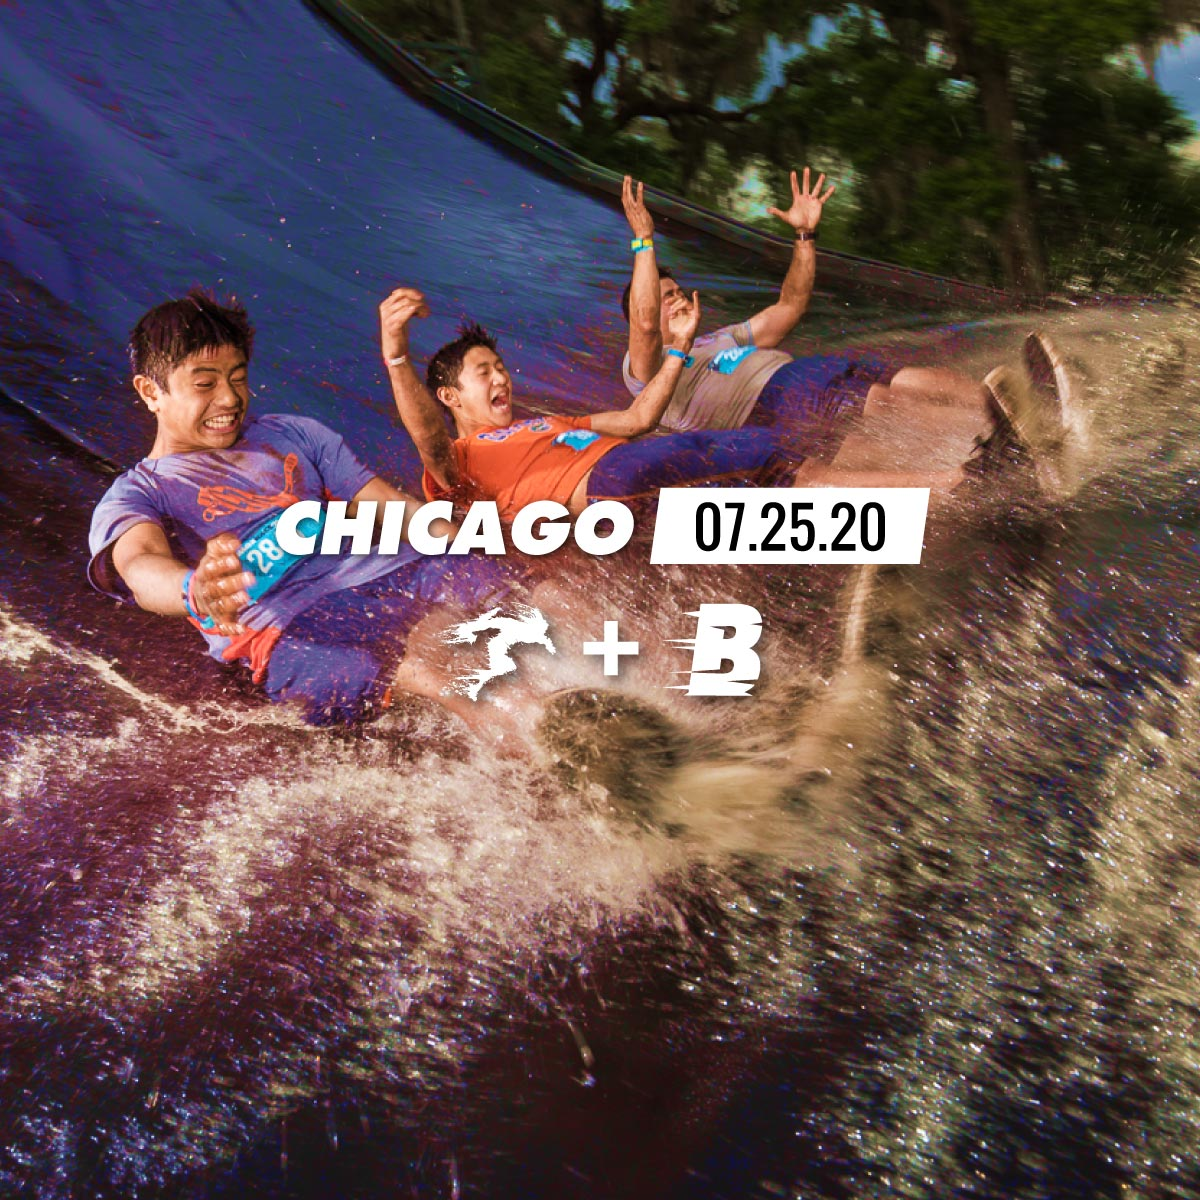 Spectator Pass - Savage Race Chicago 2020